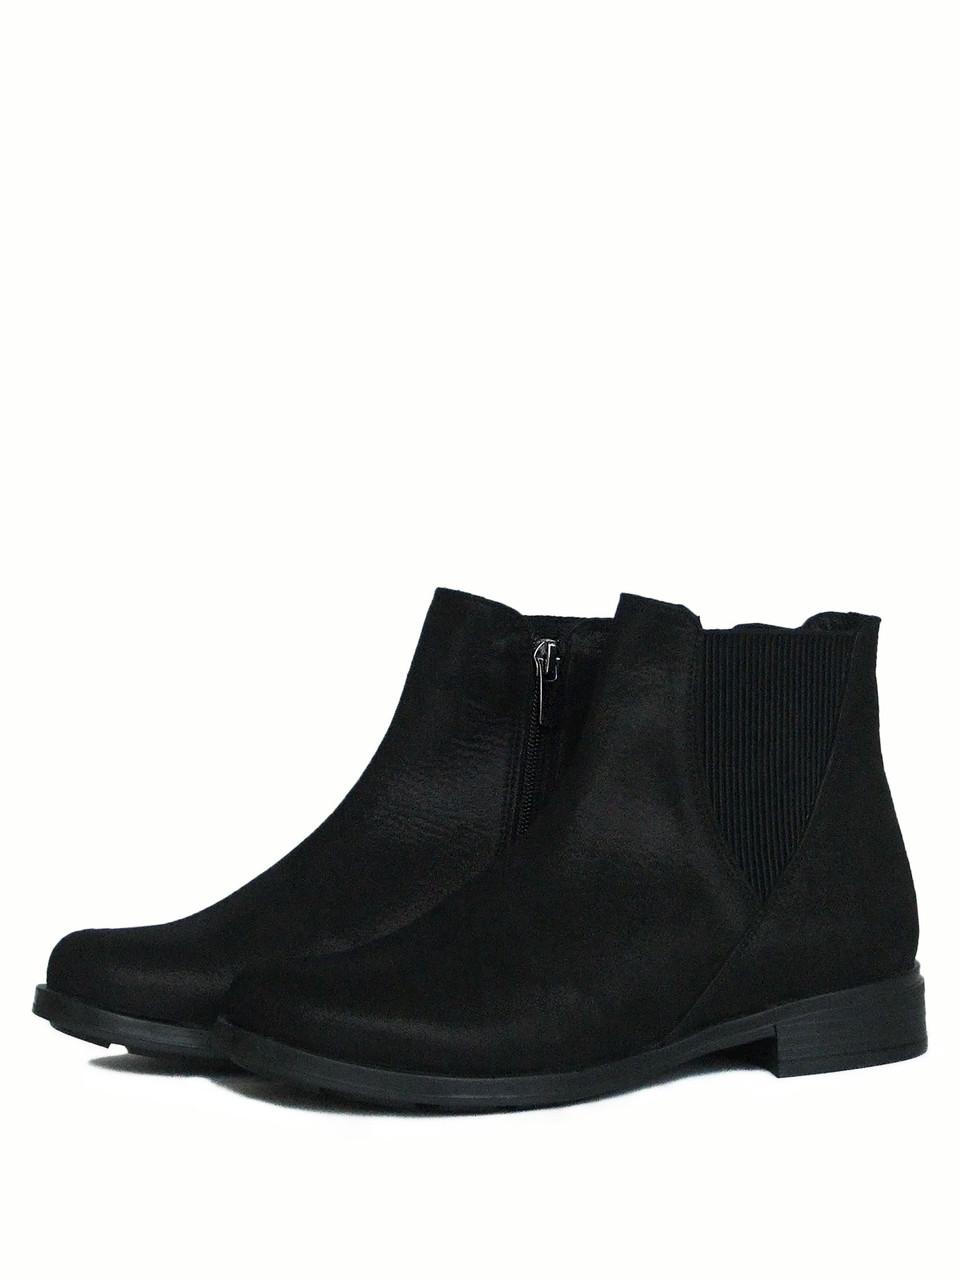 Элегантные челси ботинки женские